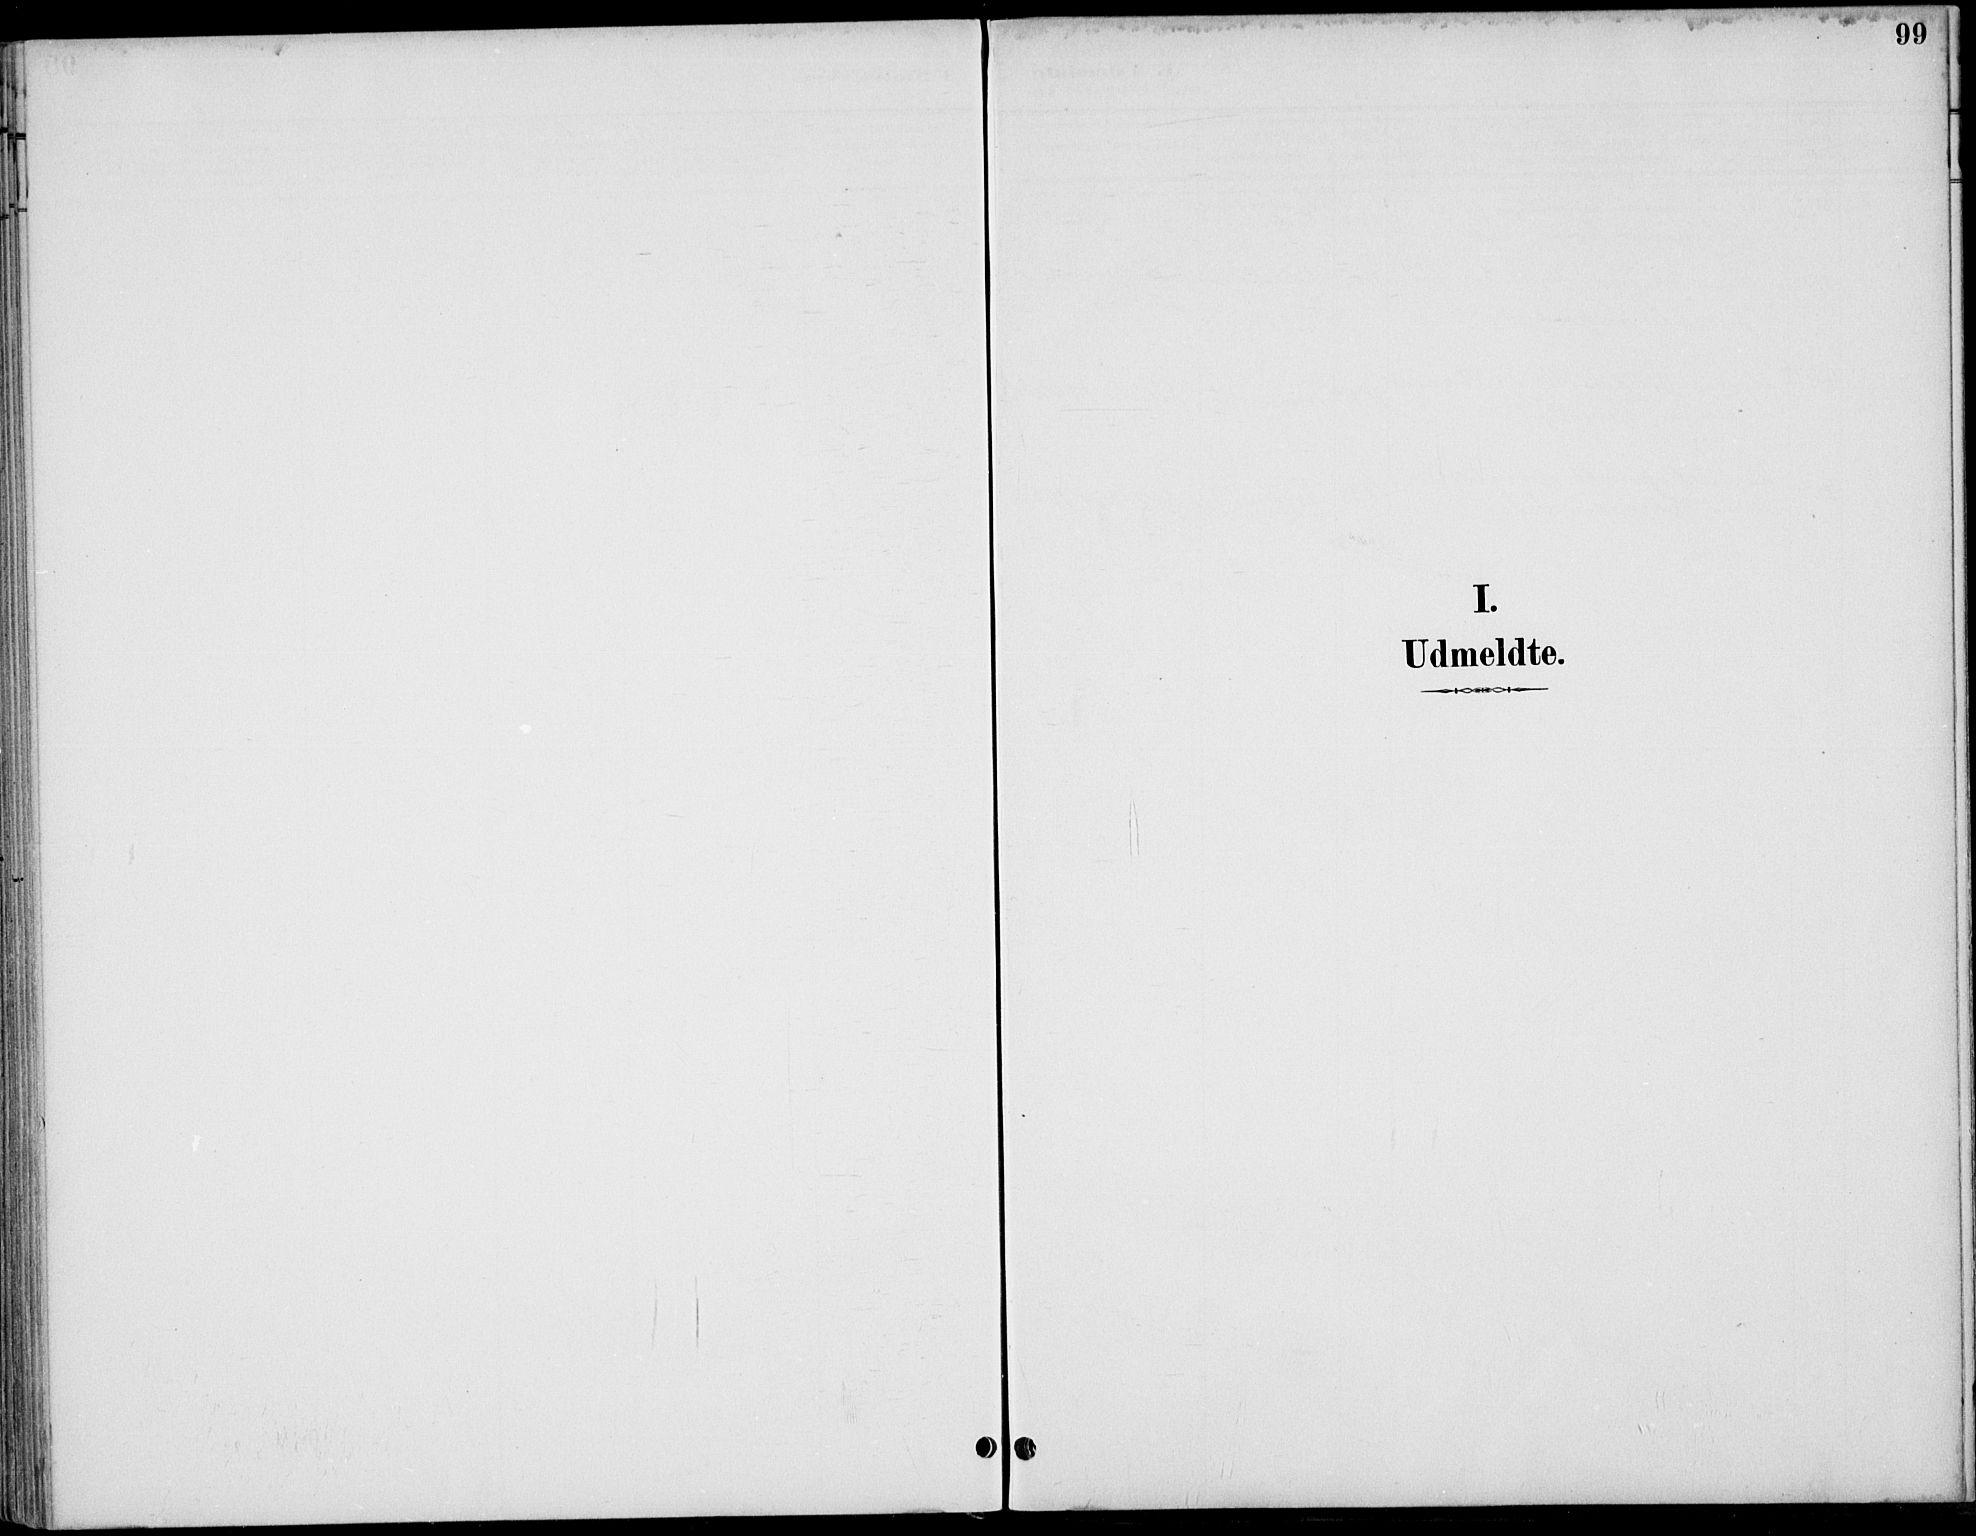 SAH, Østre Gausdal prestekontor, Ministerialbok nr. 3, 1887-1901, s. 99